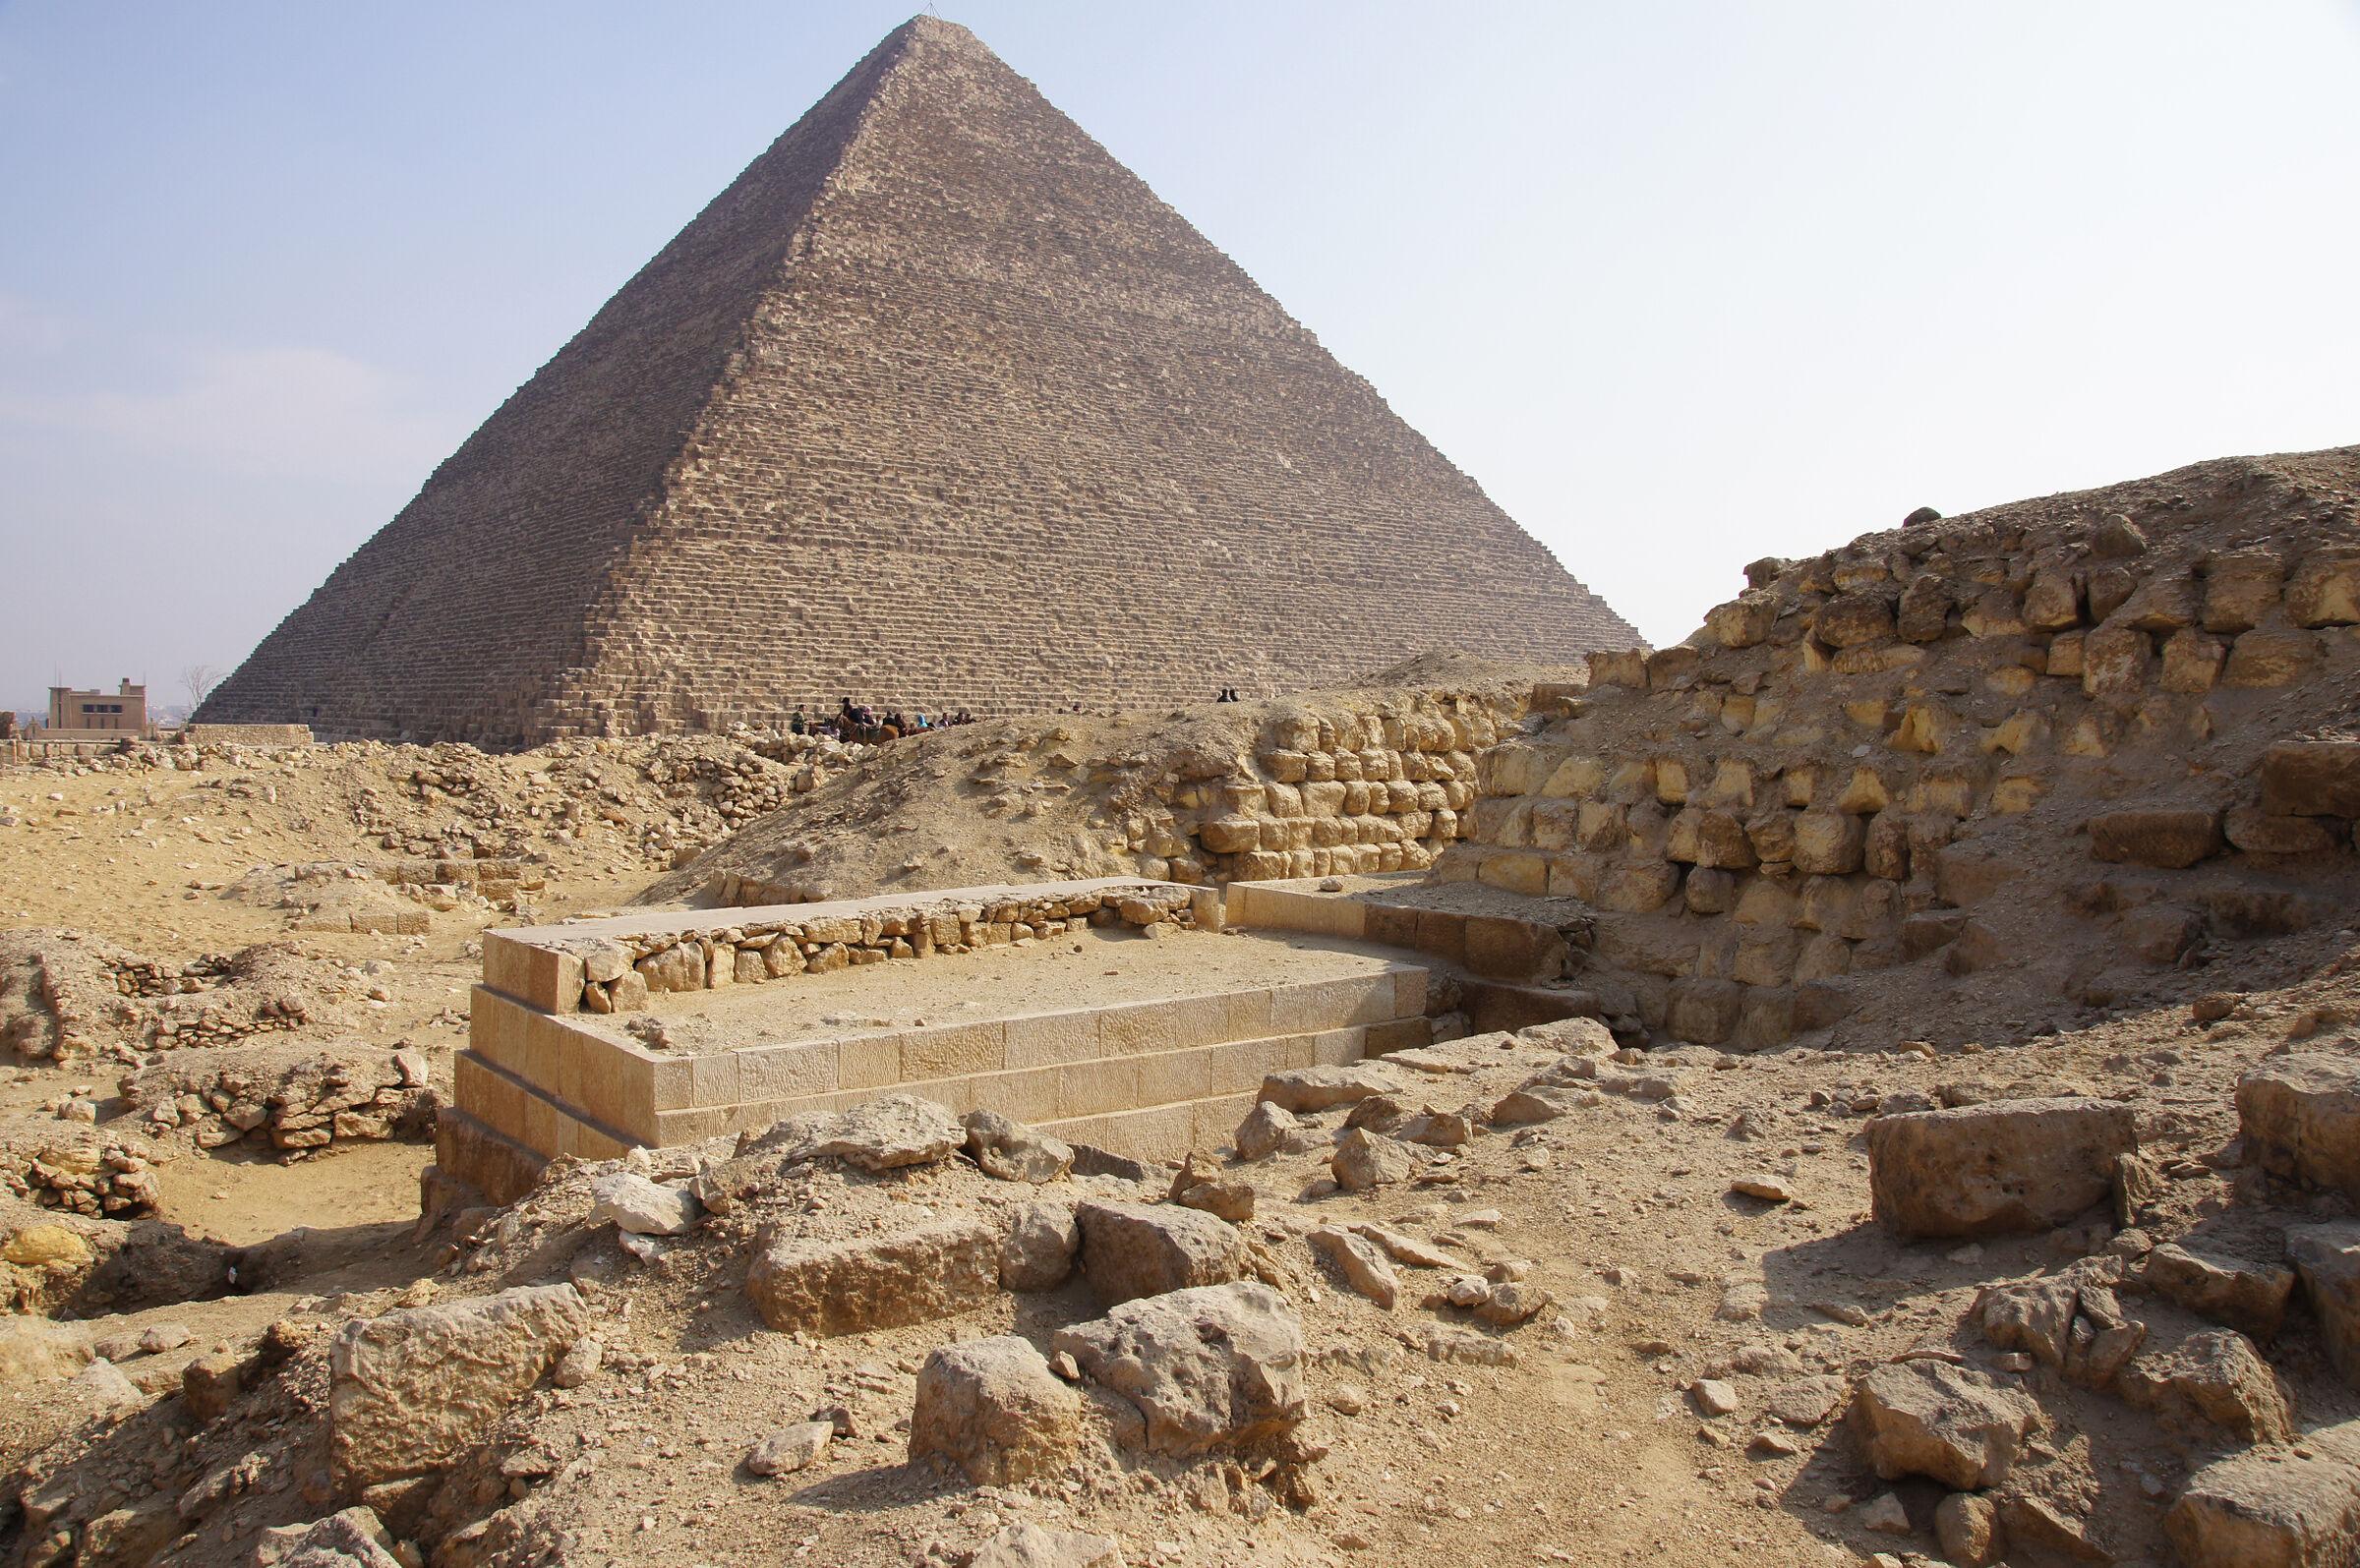 Western Cemetery: Site: Giza; View: G 2151, G 2150, G 2170, Khufu Pyramid